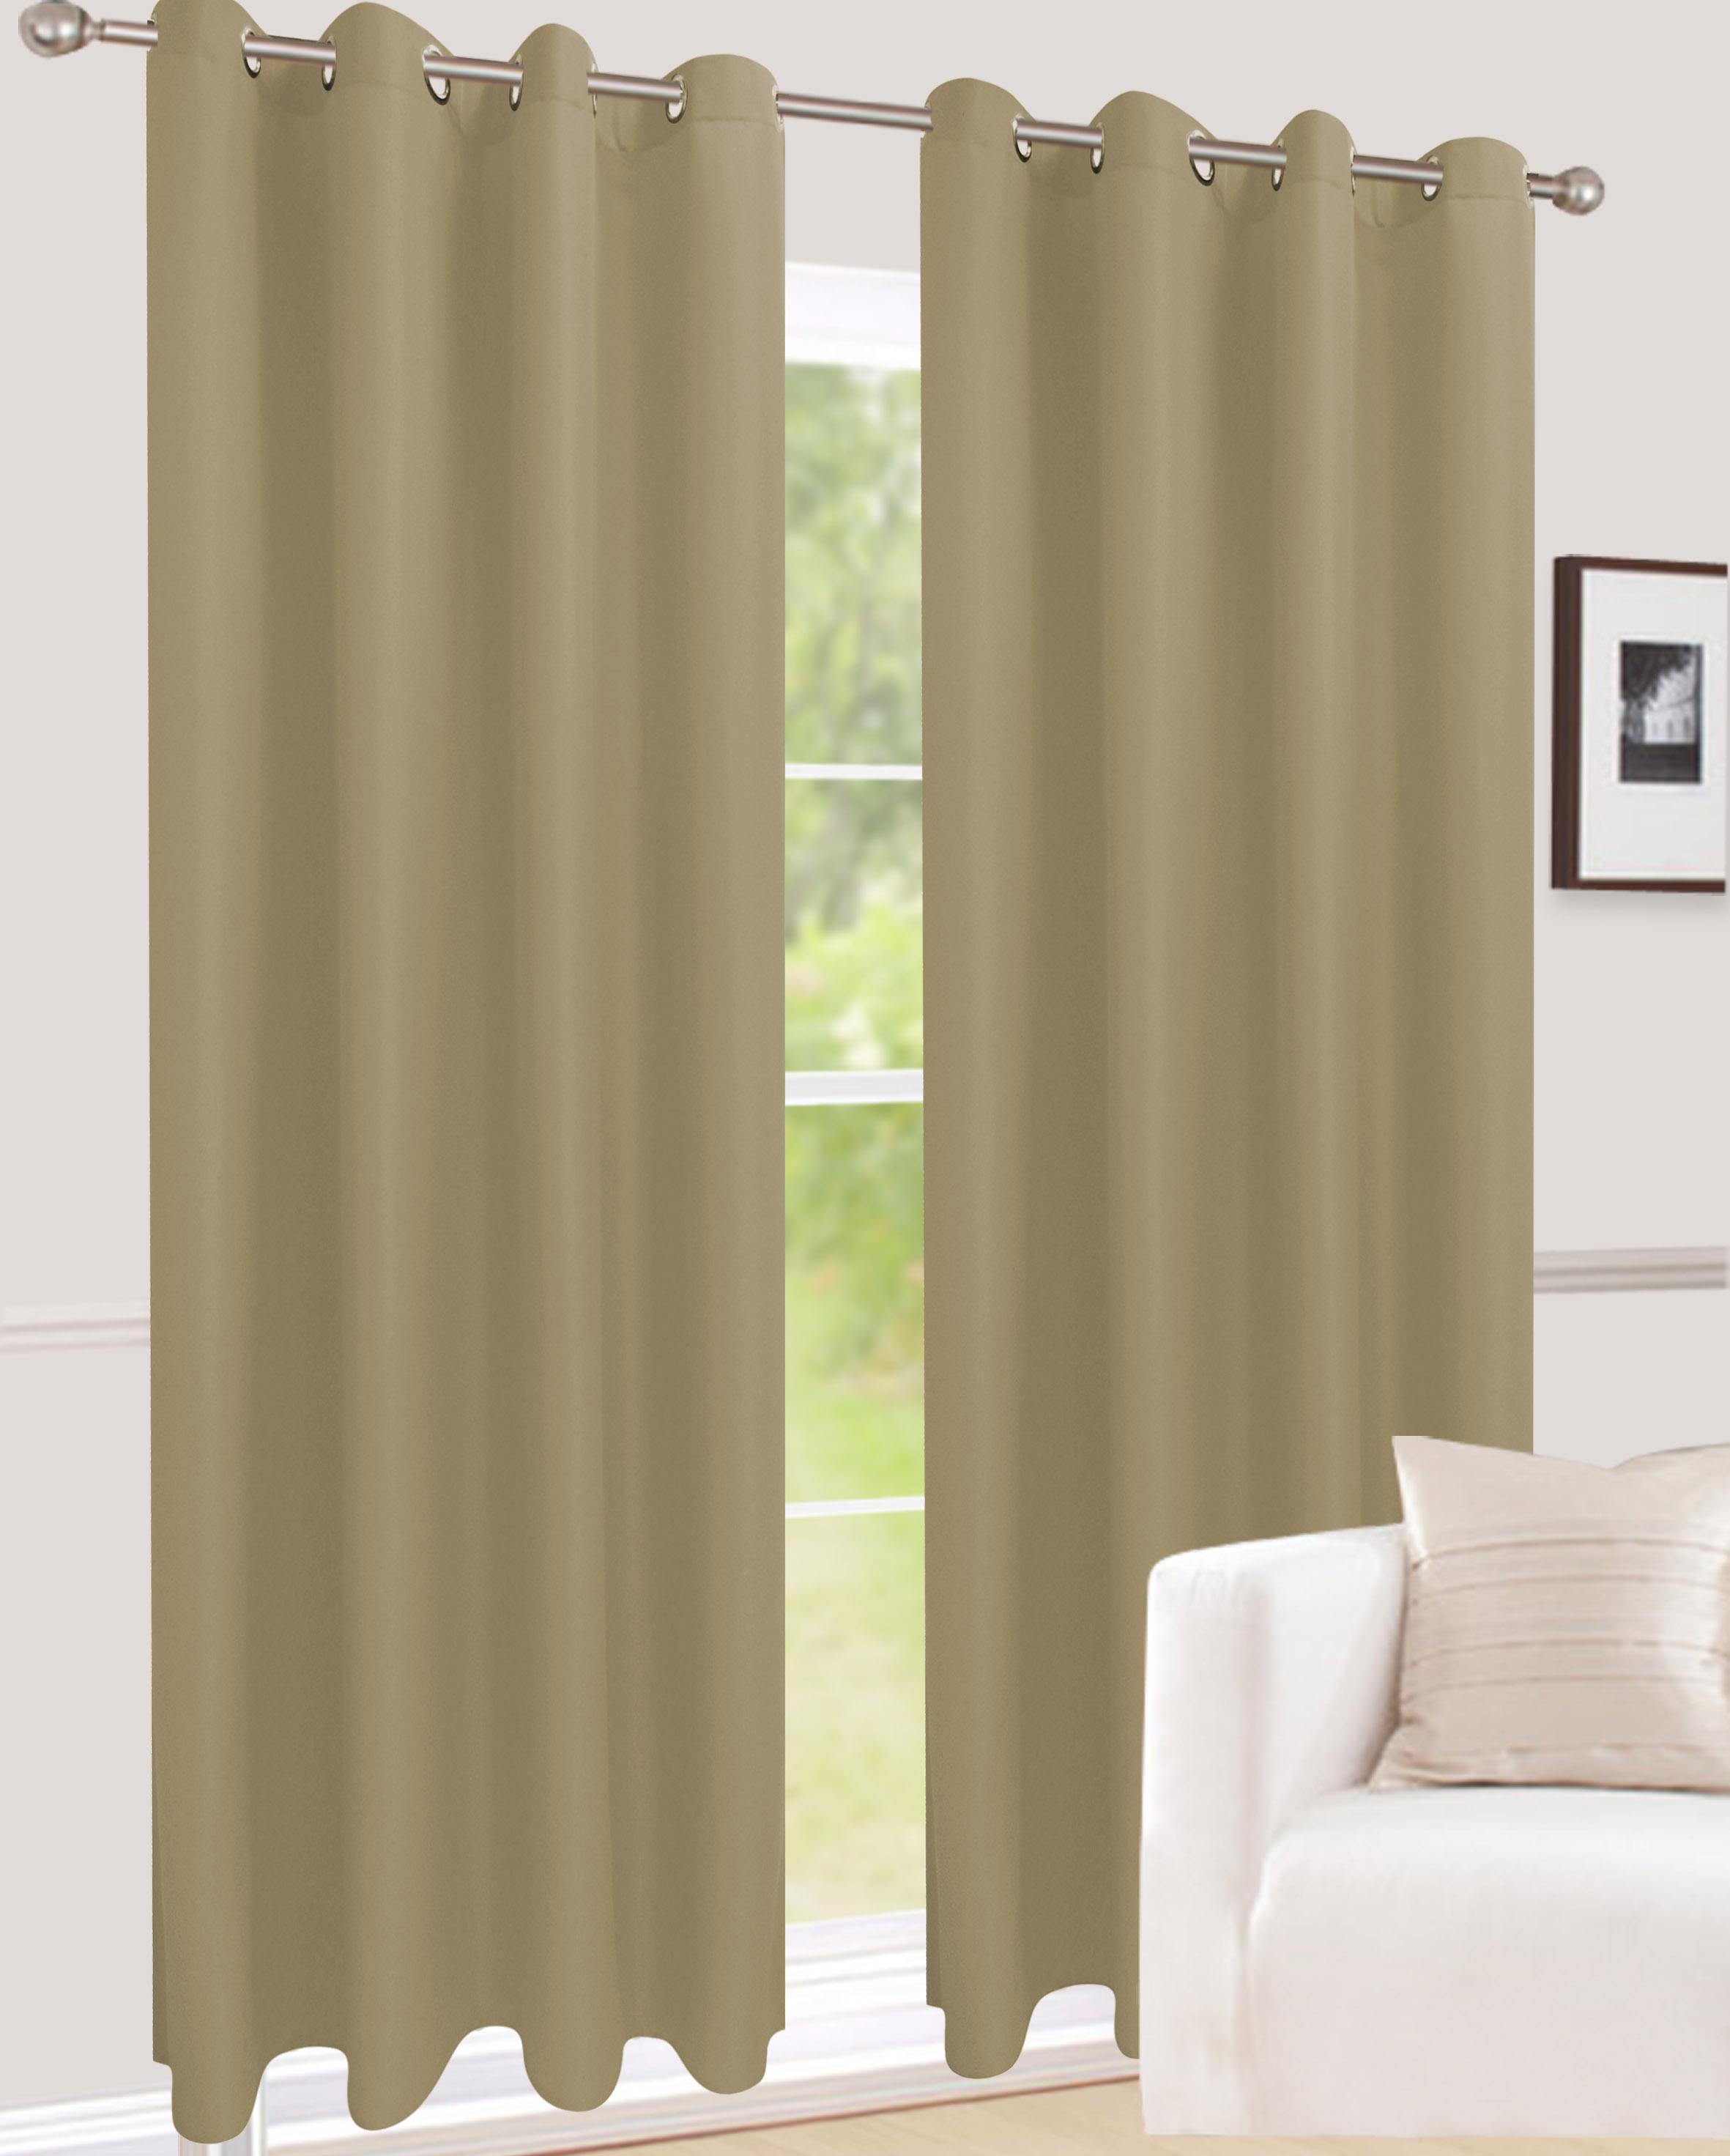 senvorhang einfarbig blickdicht dekostoff sand vita sale bn gardinen online shop. Black Bedroom Furniture Sets. Home Design Ideas